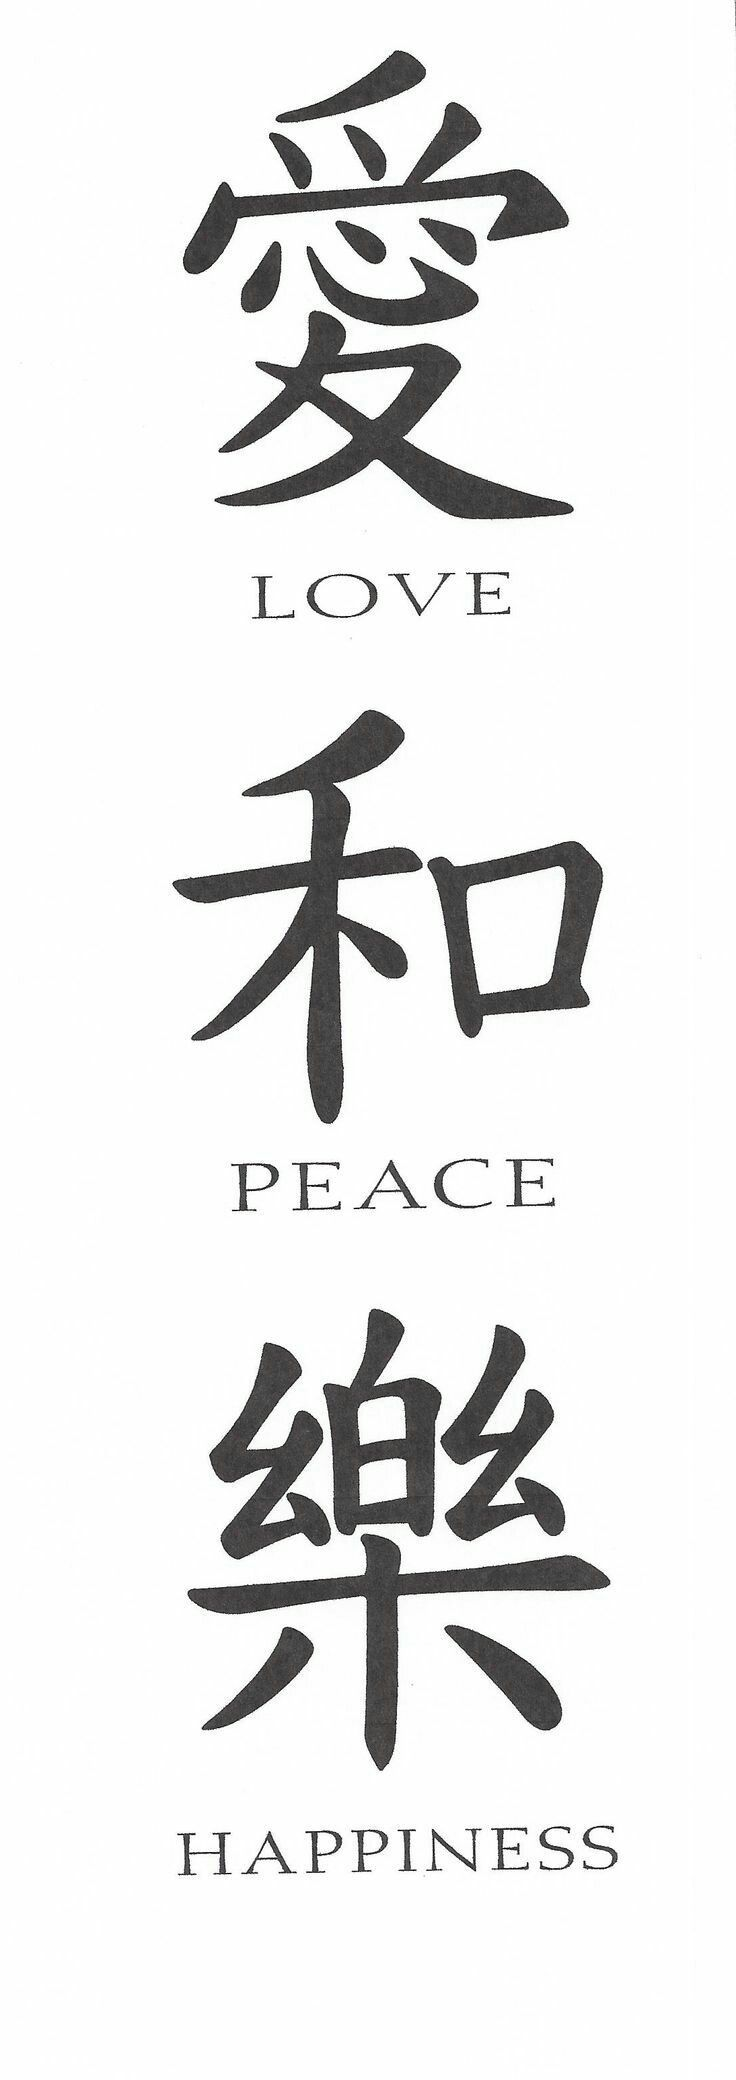 38 Best The Chinese Symbols Images On Pinterest Chinese Symbols